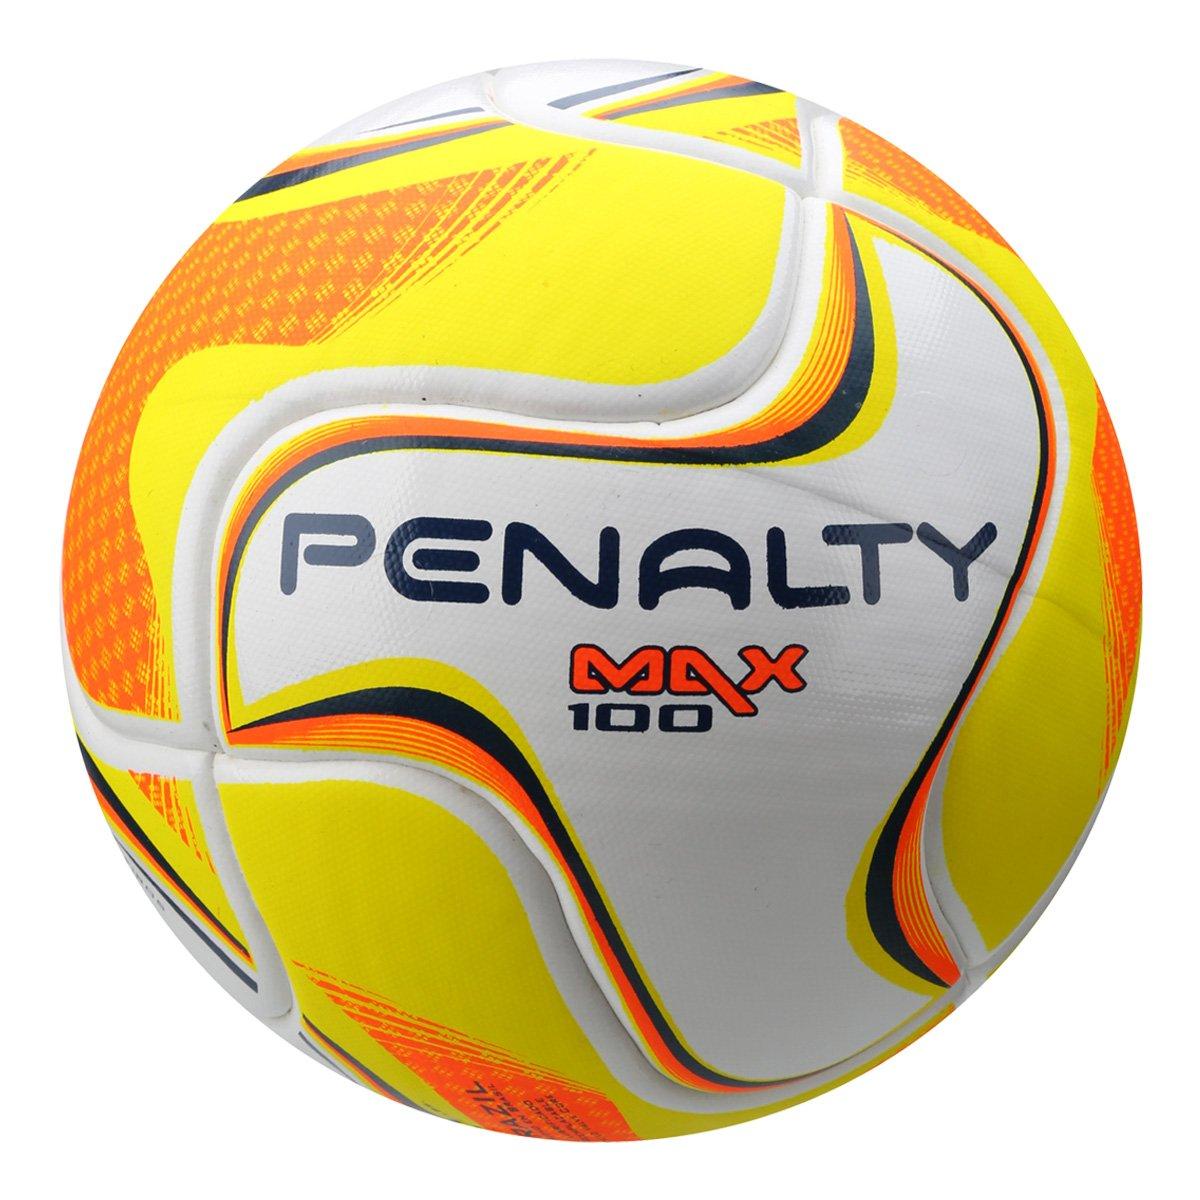 76f605714eaa2 Bola Futsal Penalty Max 100 Term VI - Compre Agora